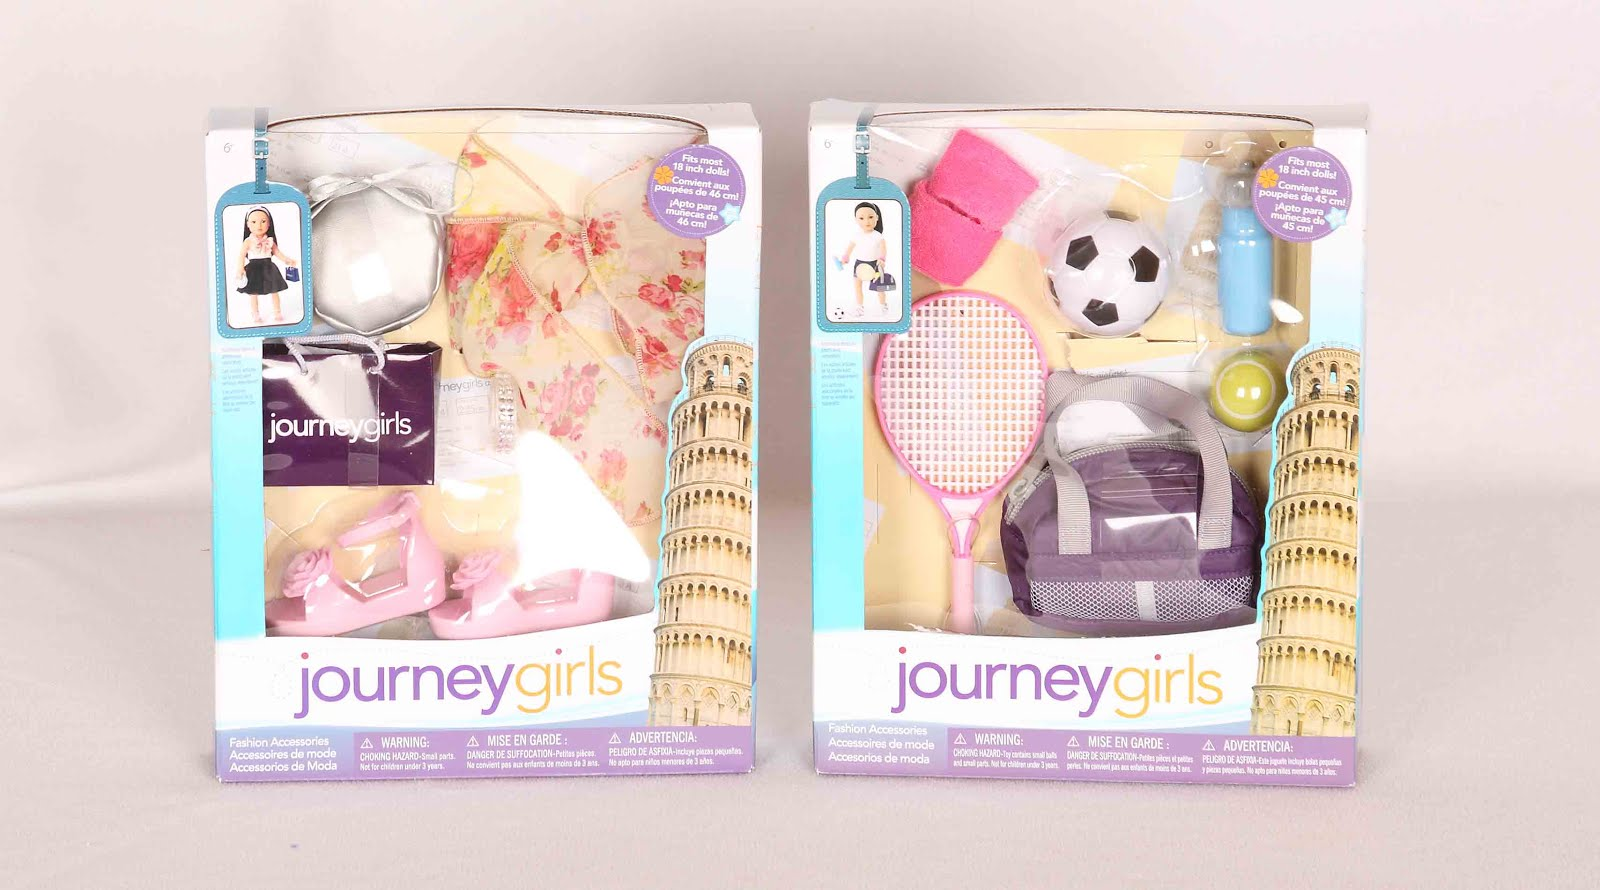 Toys R Us Journey Girls : My journey girls dolls adventures: 2015